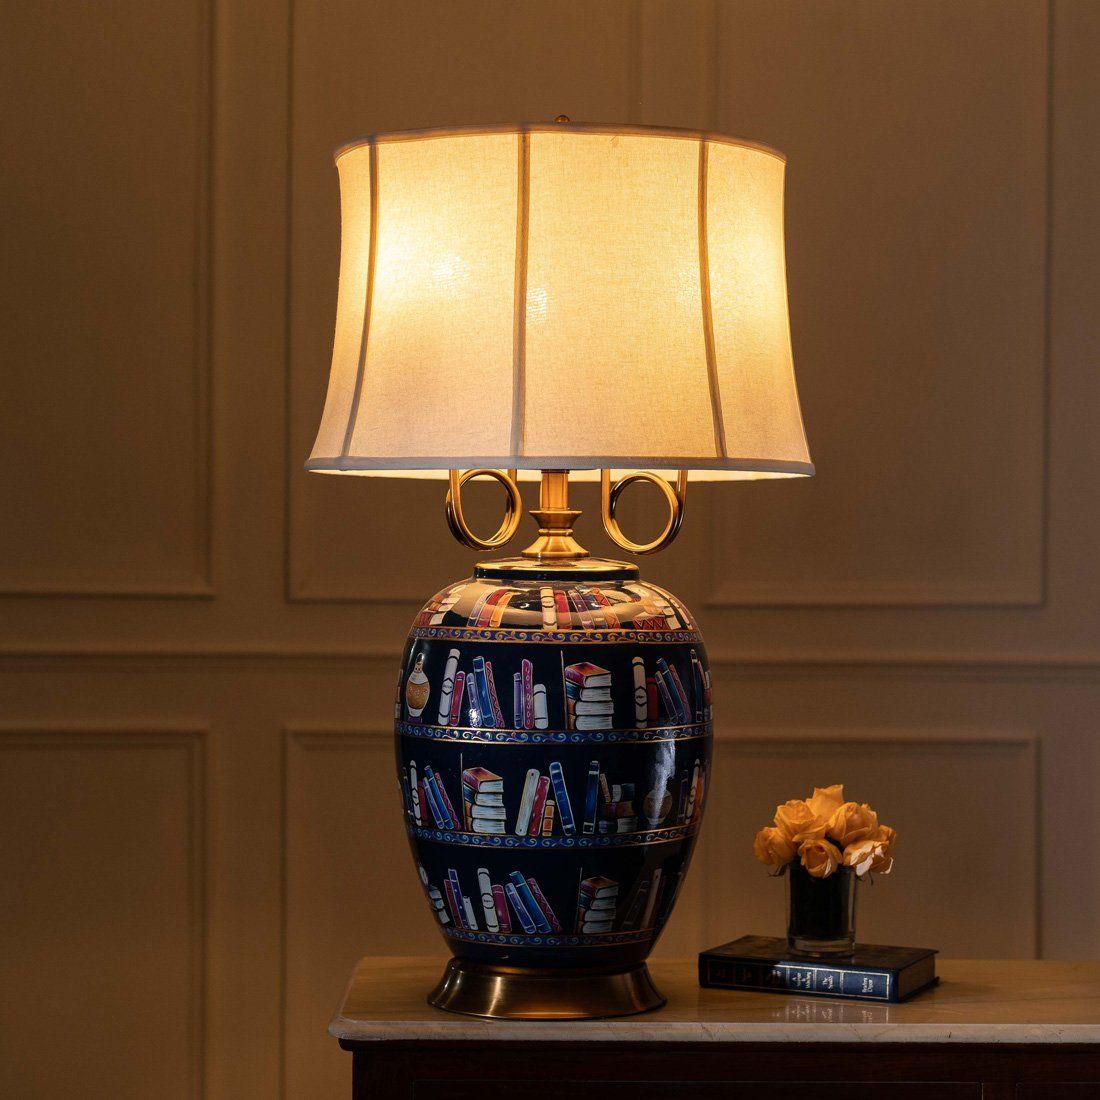 The Scholar Ceramic Table Lamp Table Lamp Lamp Ceramic Table Lamps